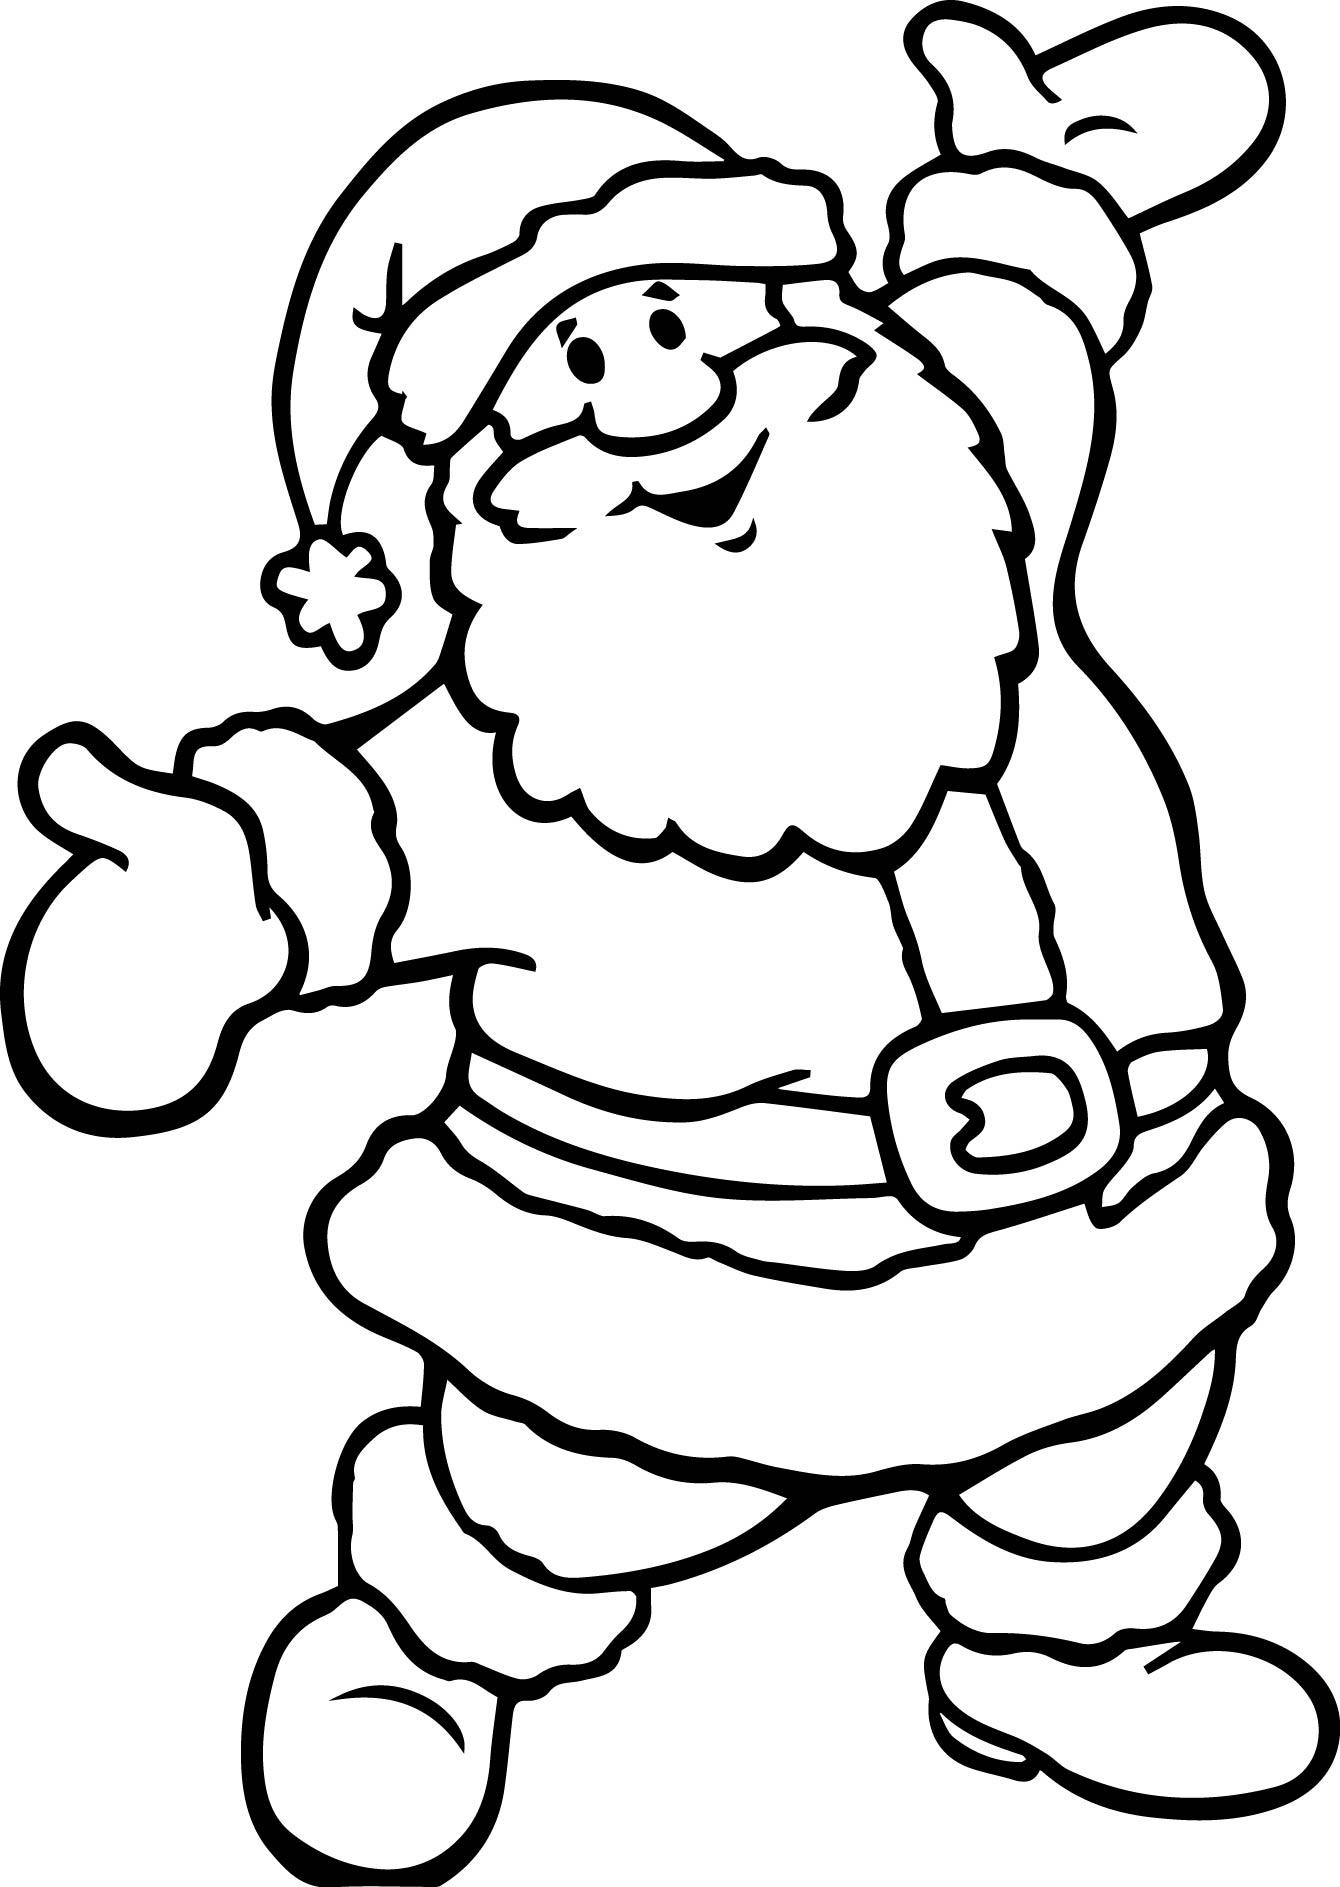 Santa Claus Printable Coloring Pages